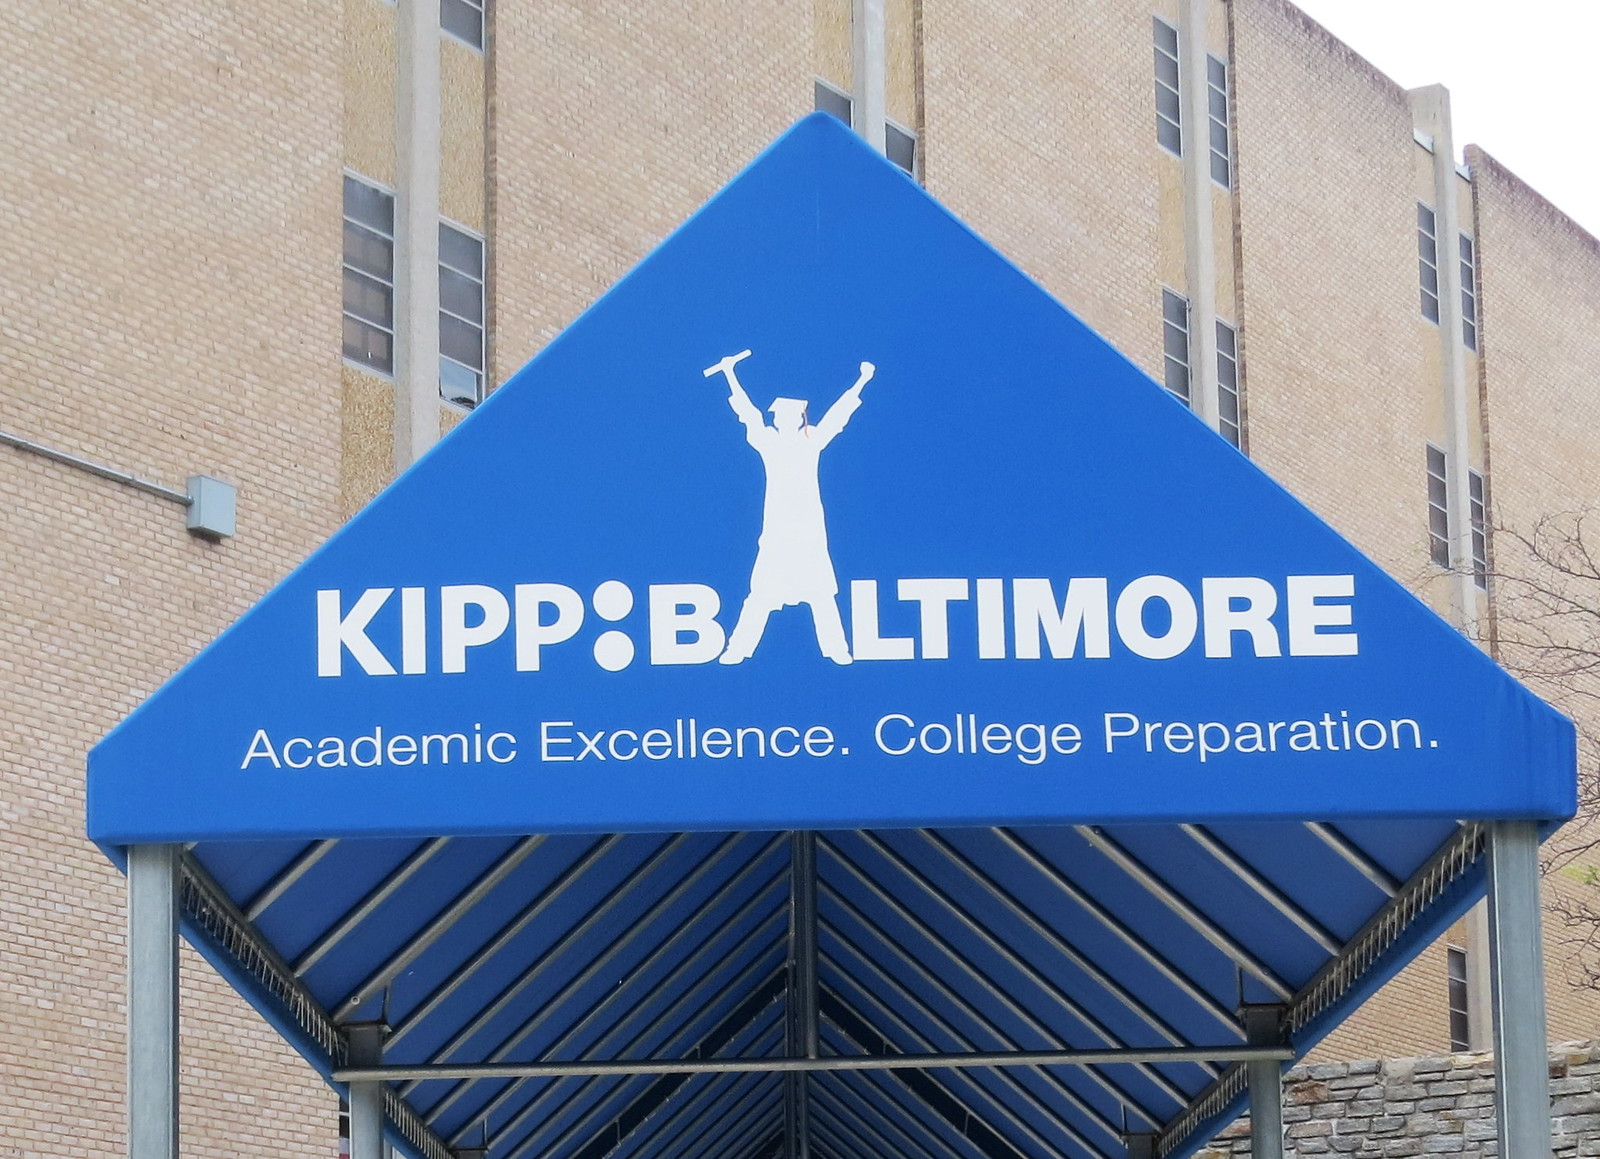 Graphics-Kipp Baltimore School Awning